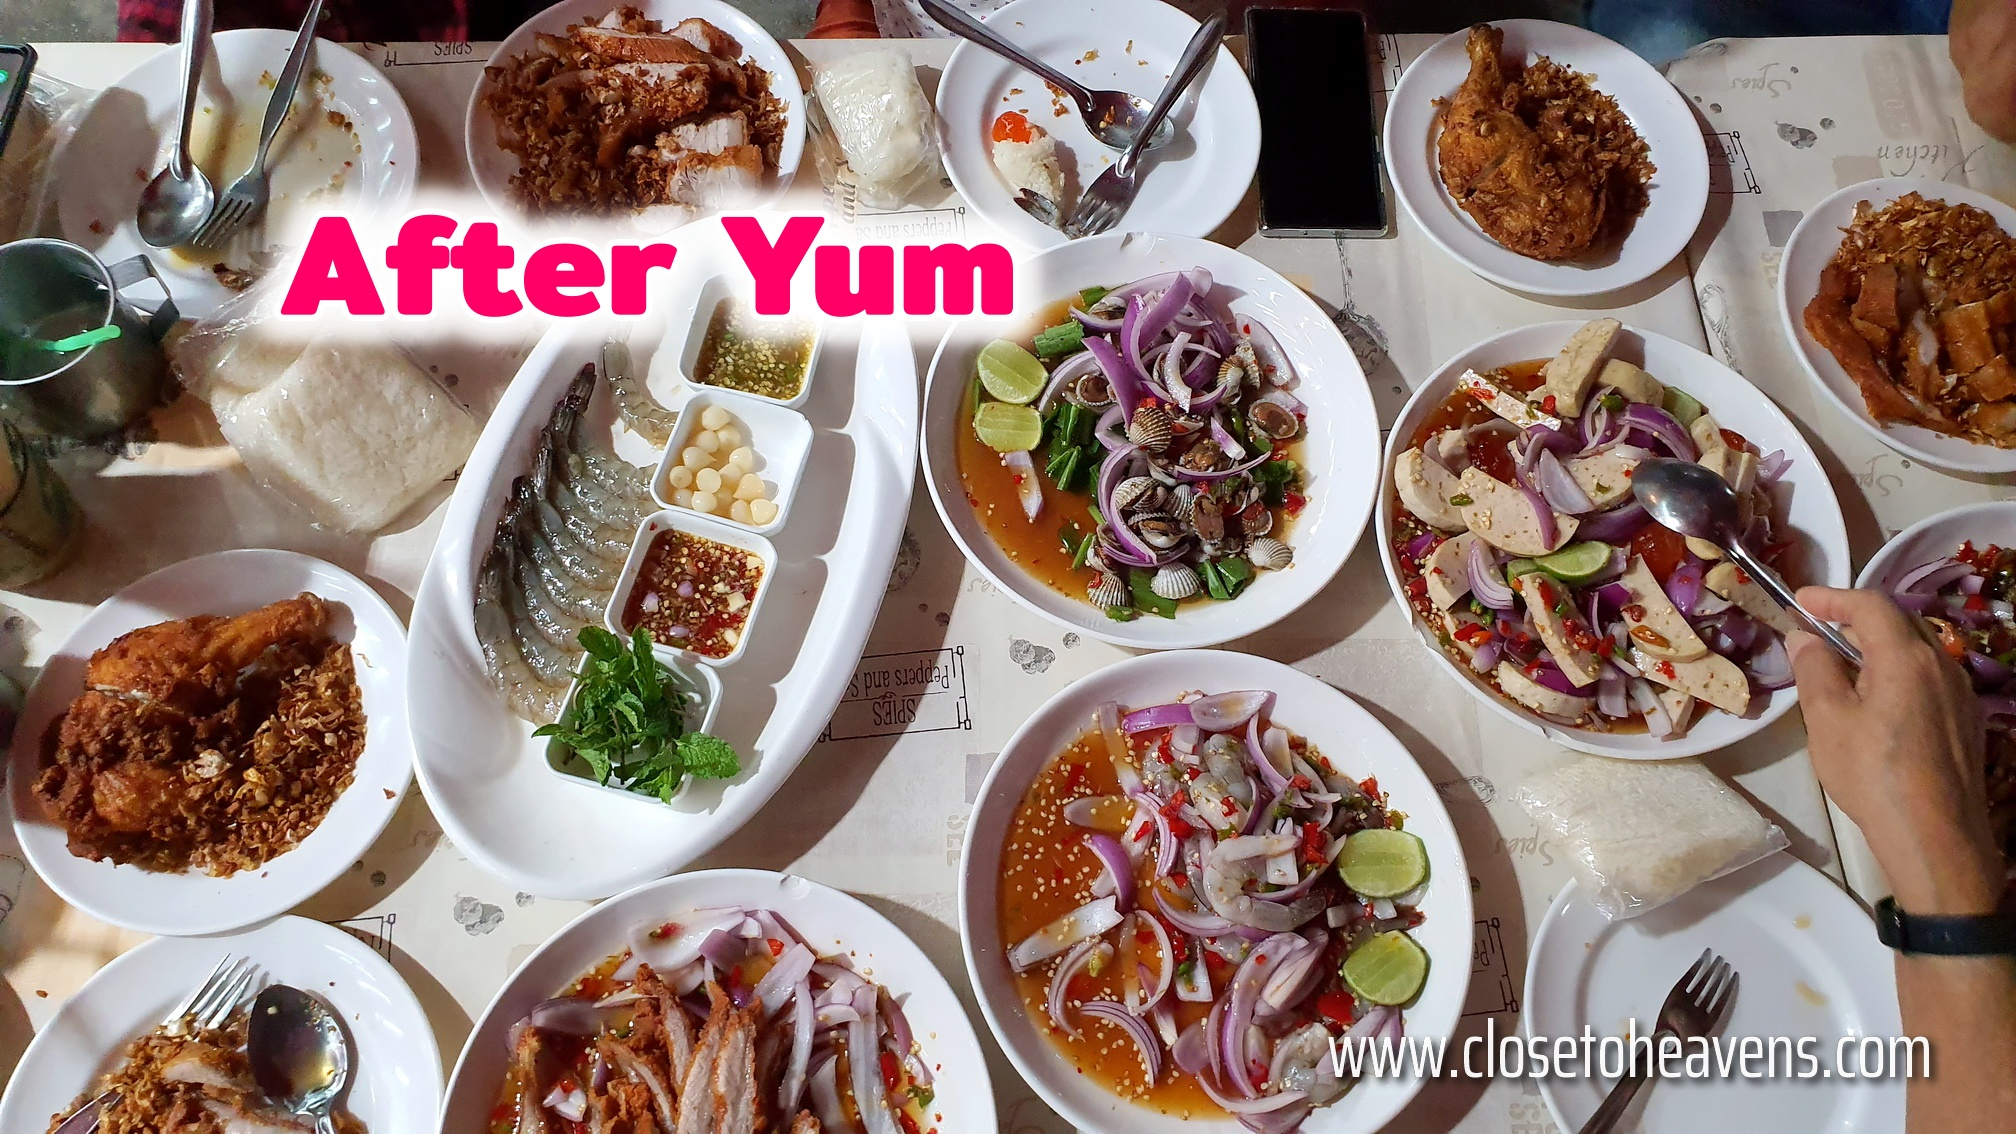 After Yum พัทยา 24 คน 88 จาน